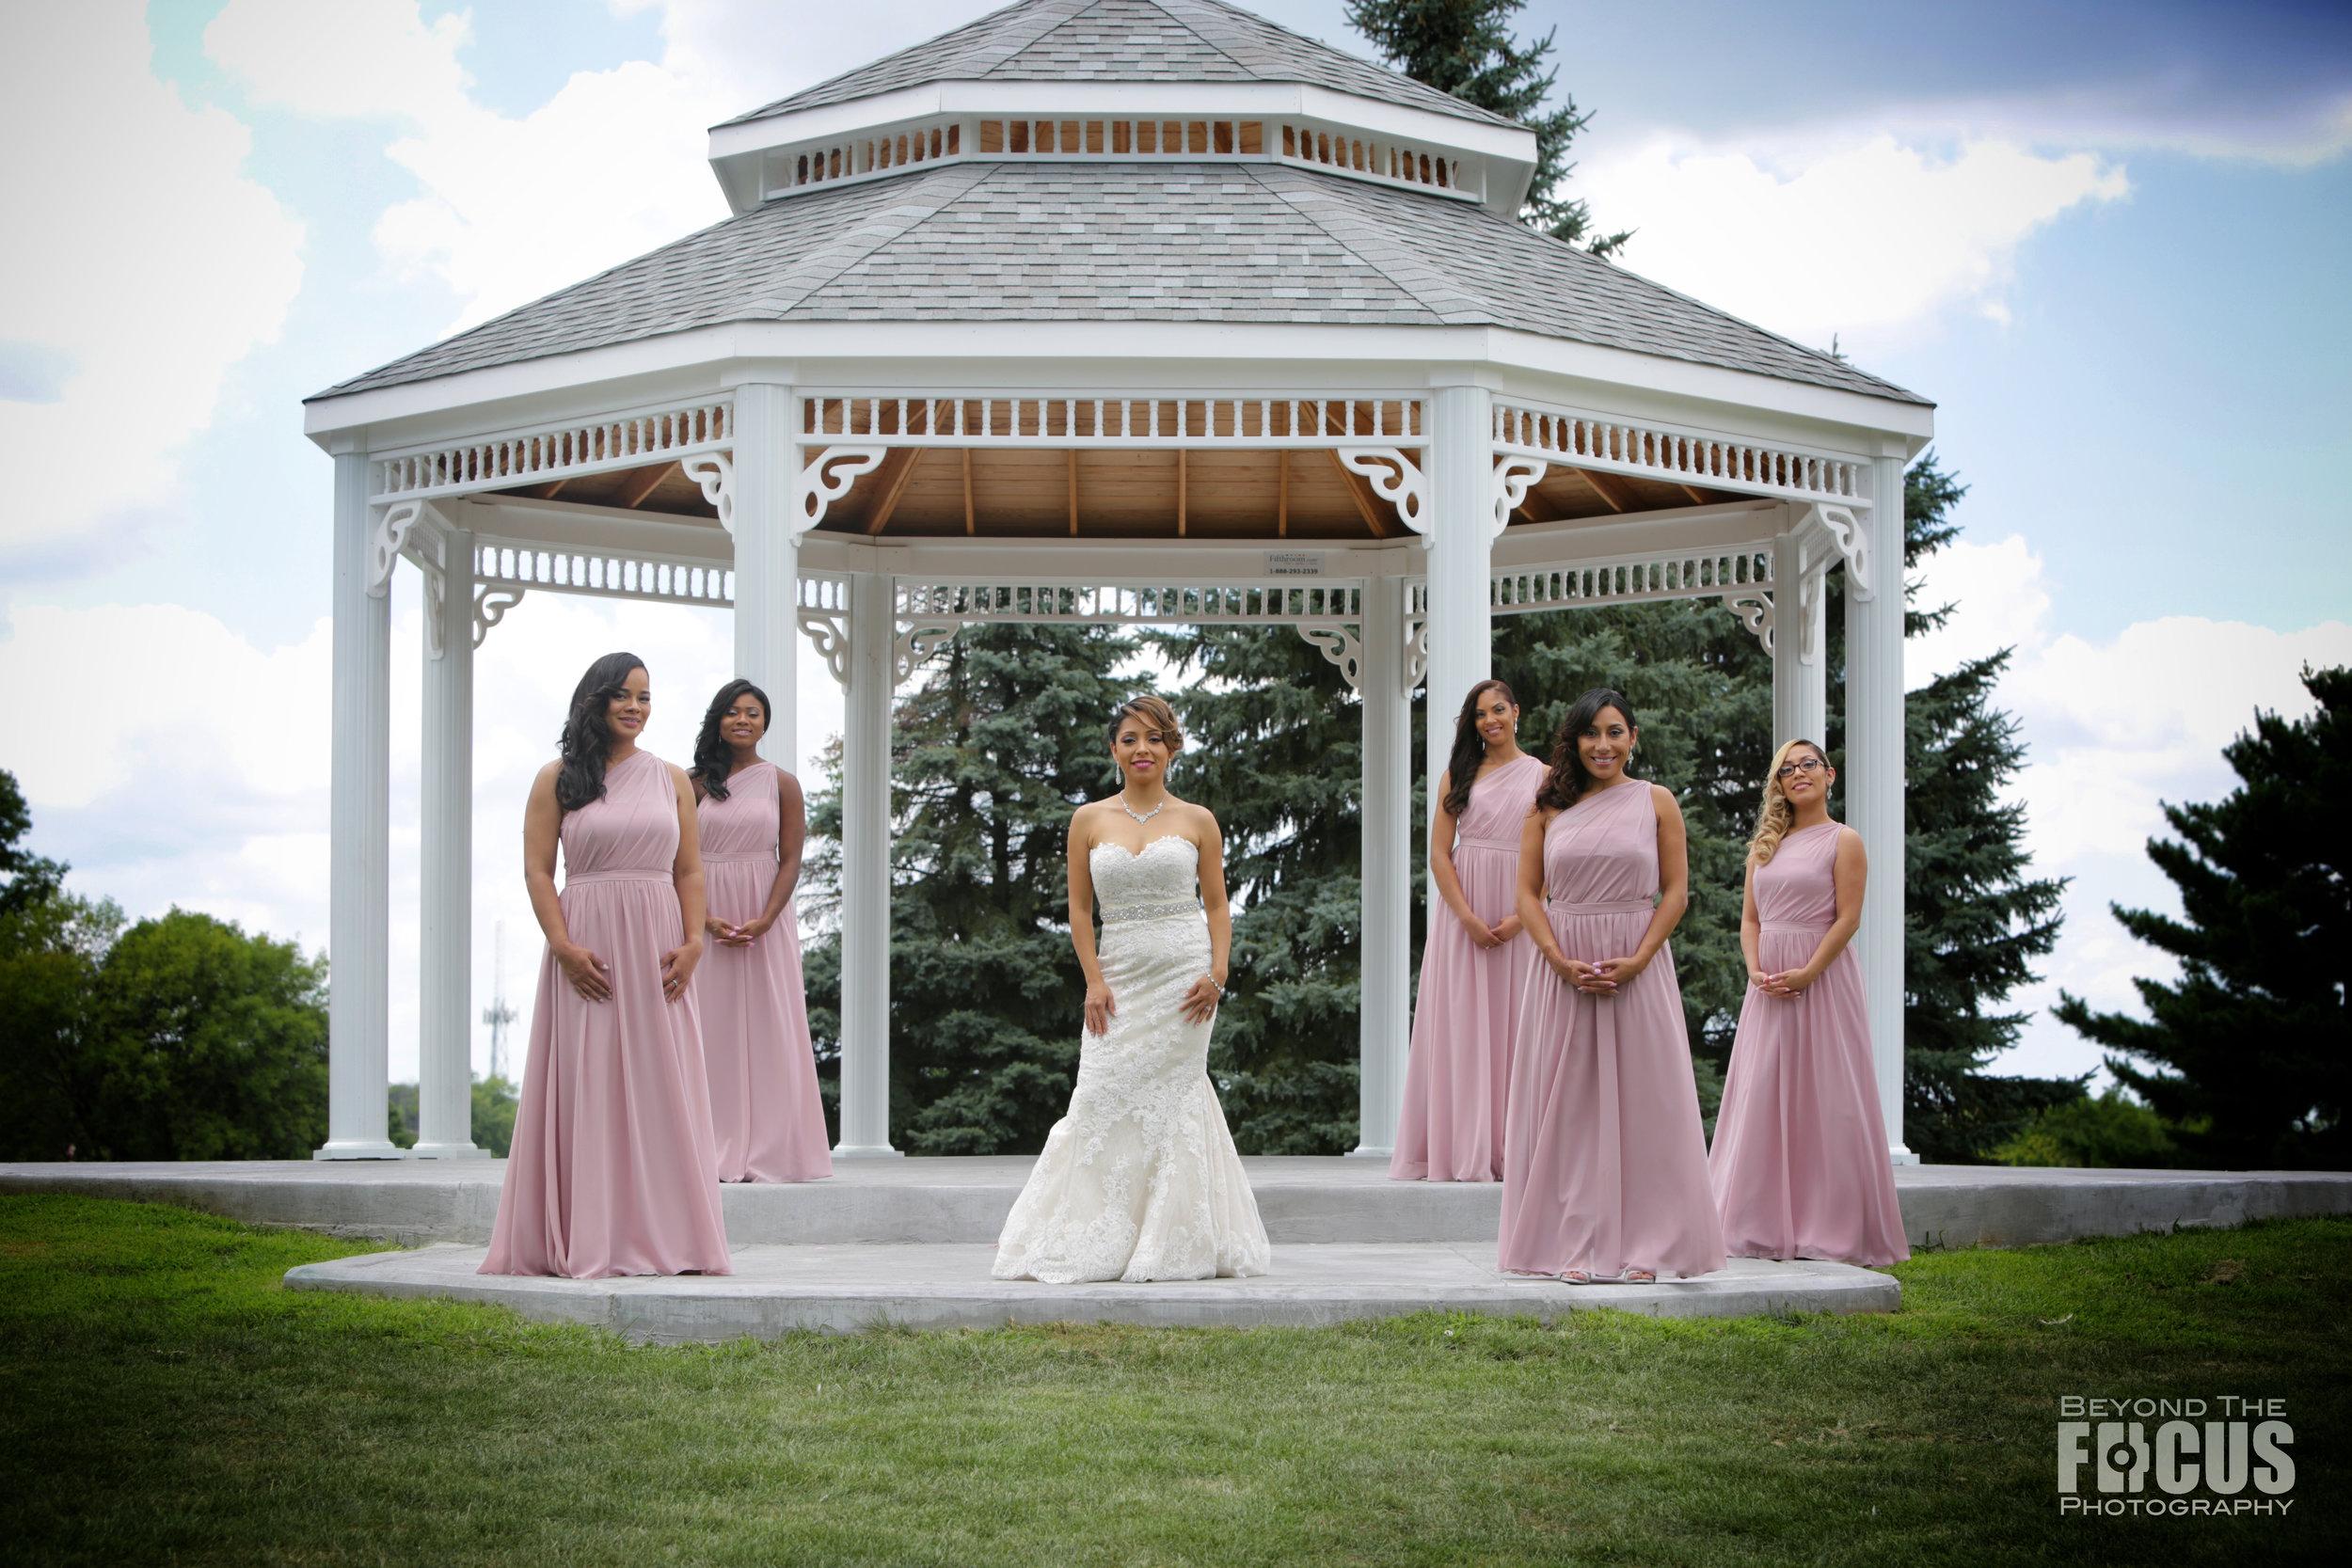 Palmer Wedding - Pre-Wedding Photos 9.jpg